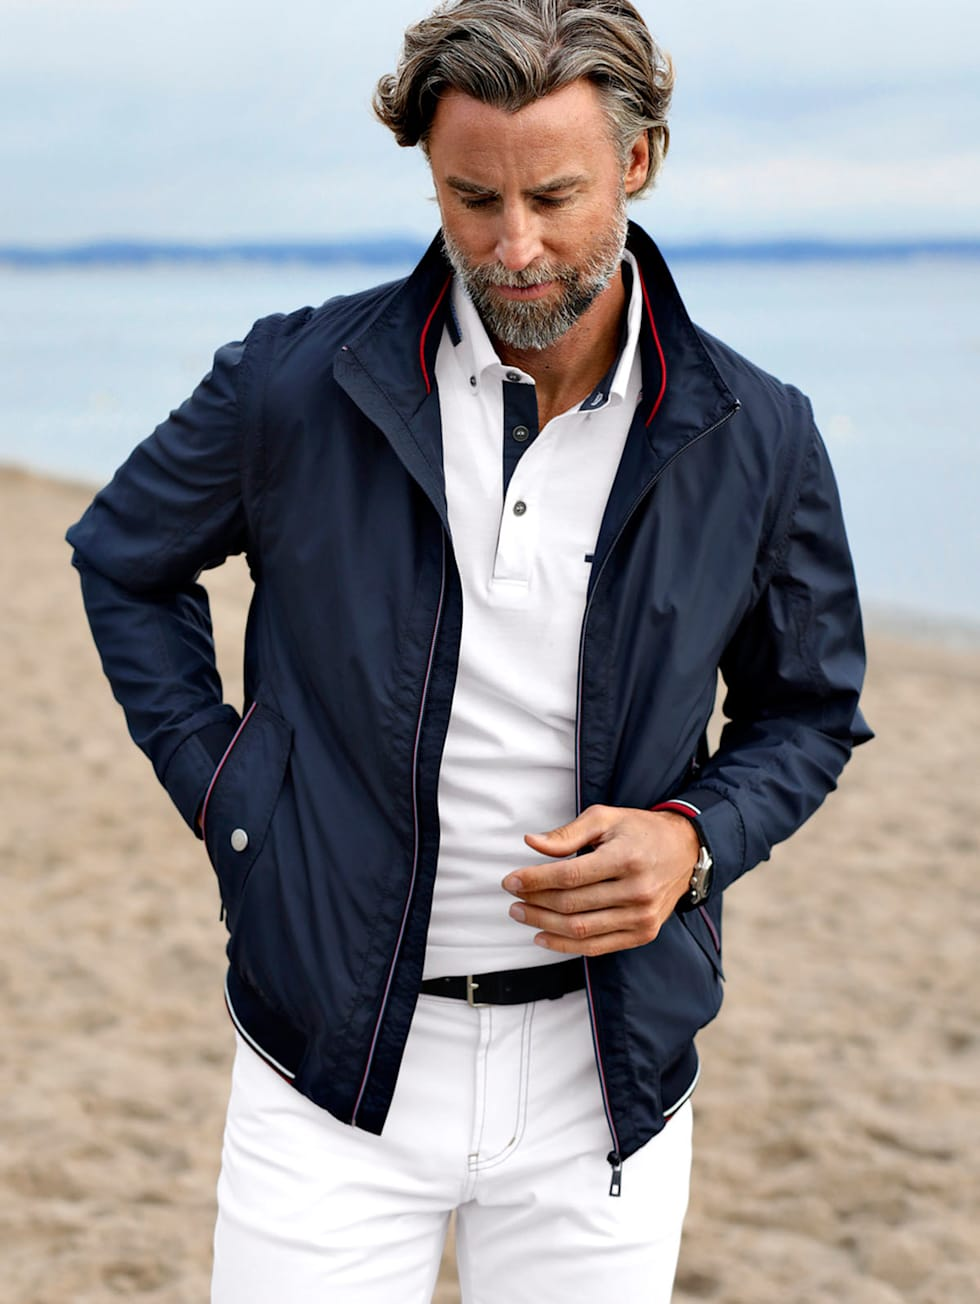 Marittimo-Outfit: Dunkelblauer Blouson, weißes Poloshirt und weiße Hose